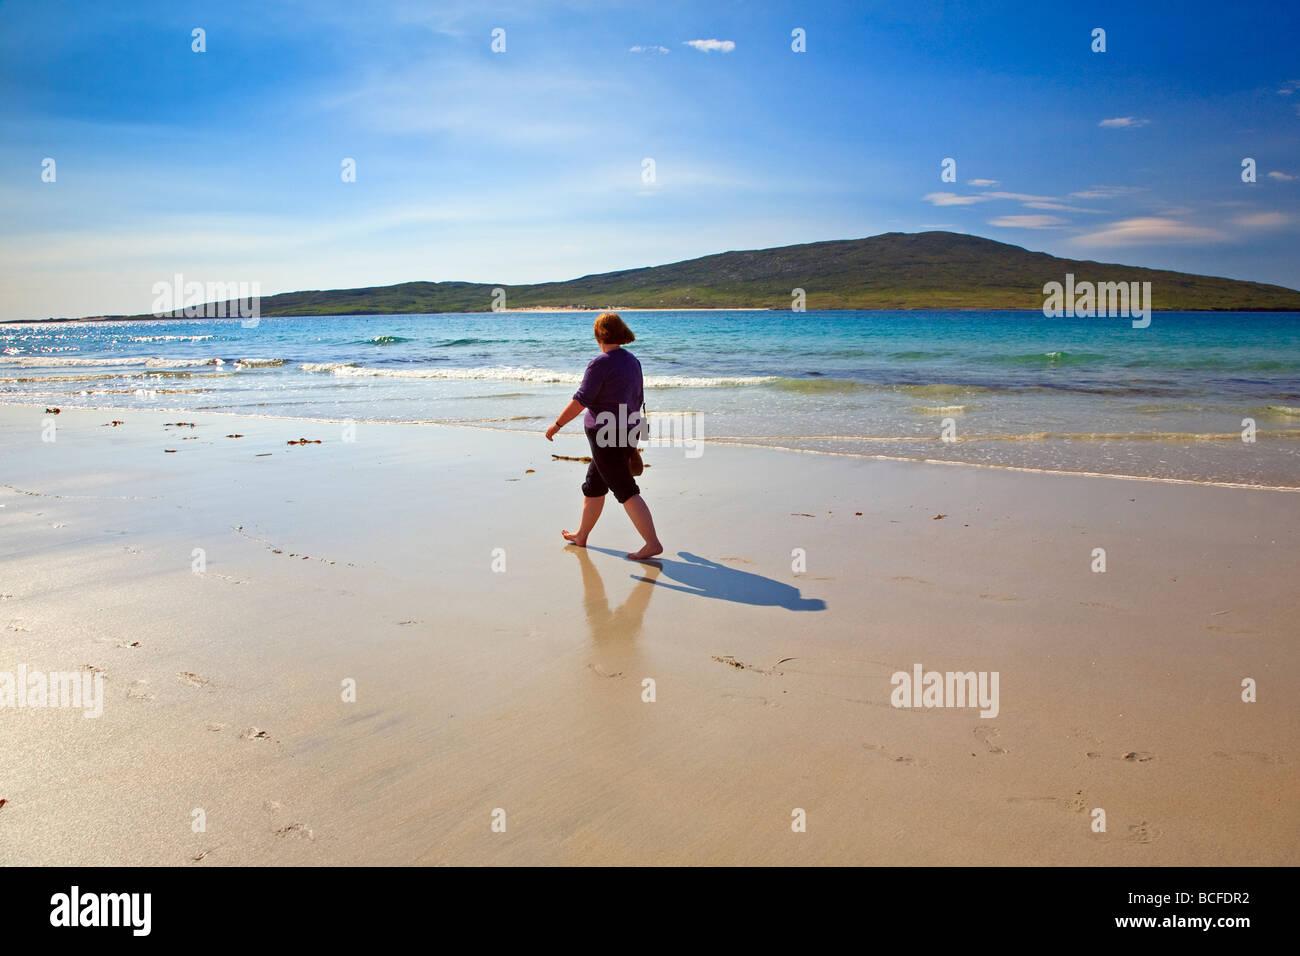 A woman walking accross a sandy beach near Luskentyre Isle of Harris, Outer Hebrides, western isles, Scotland, UK - Stock Image